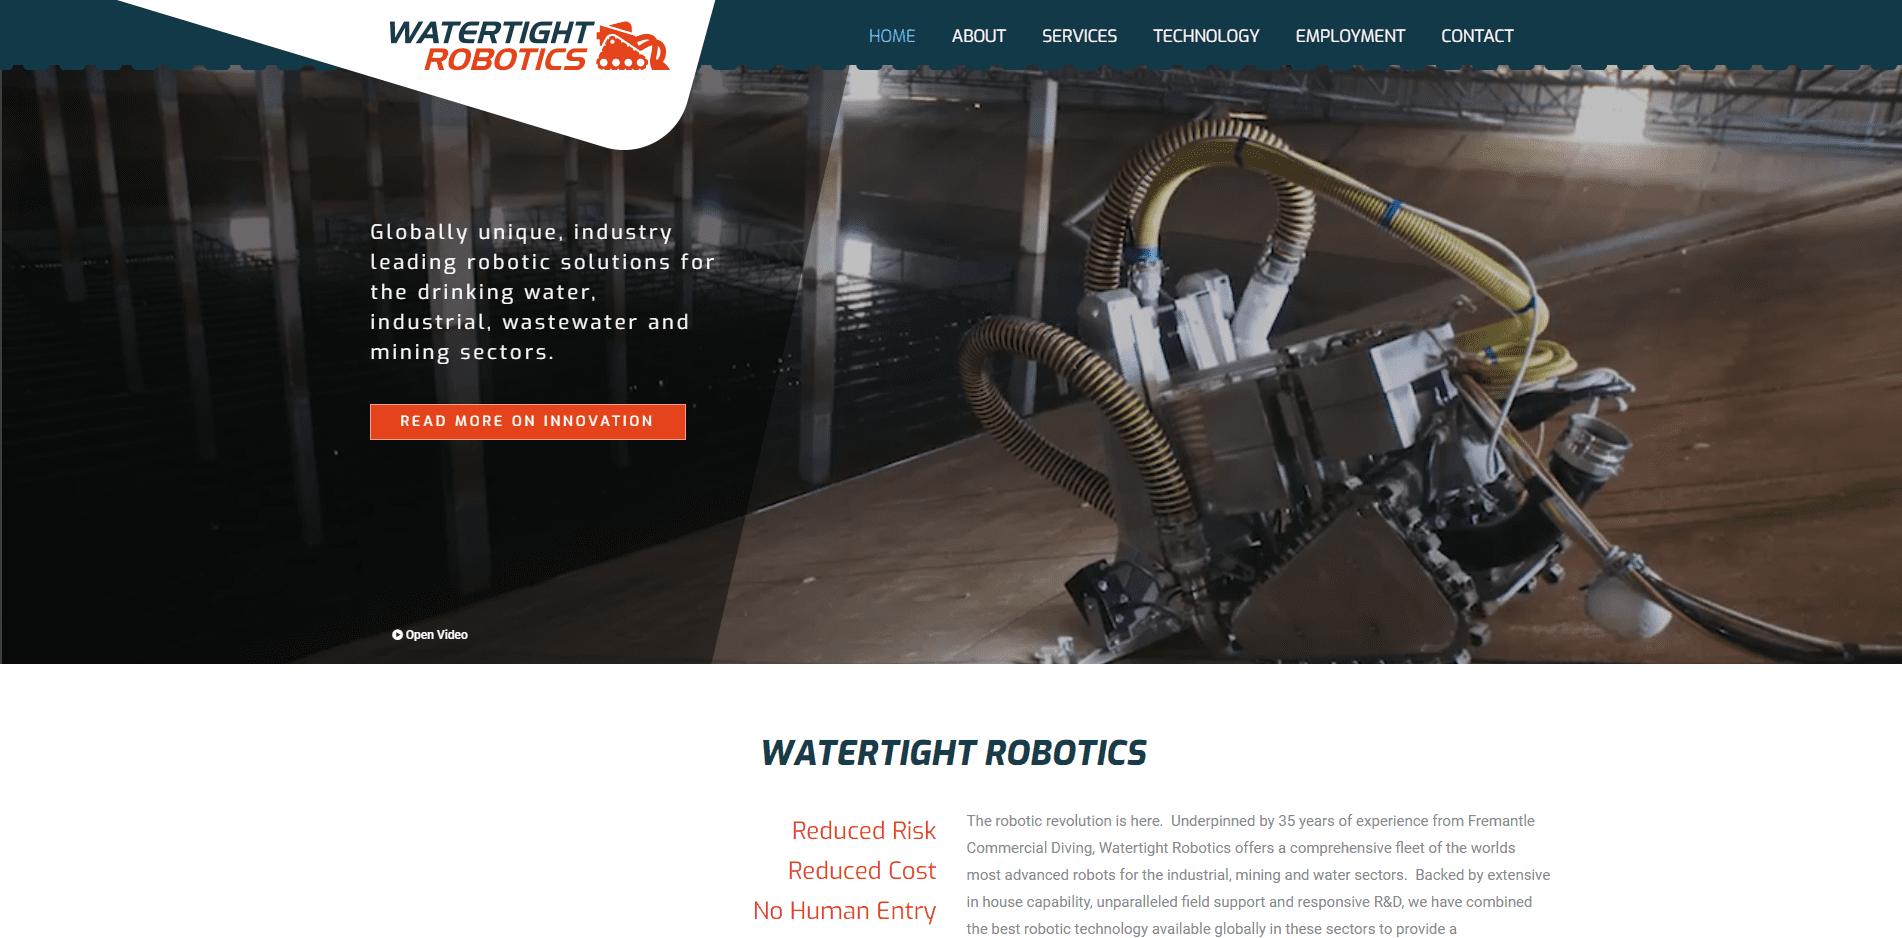 Watertight Robotics